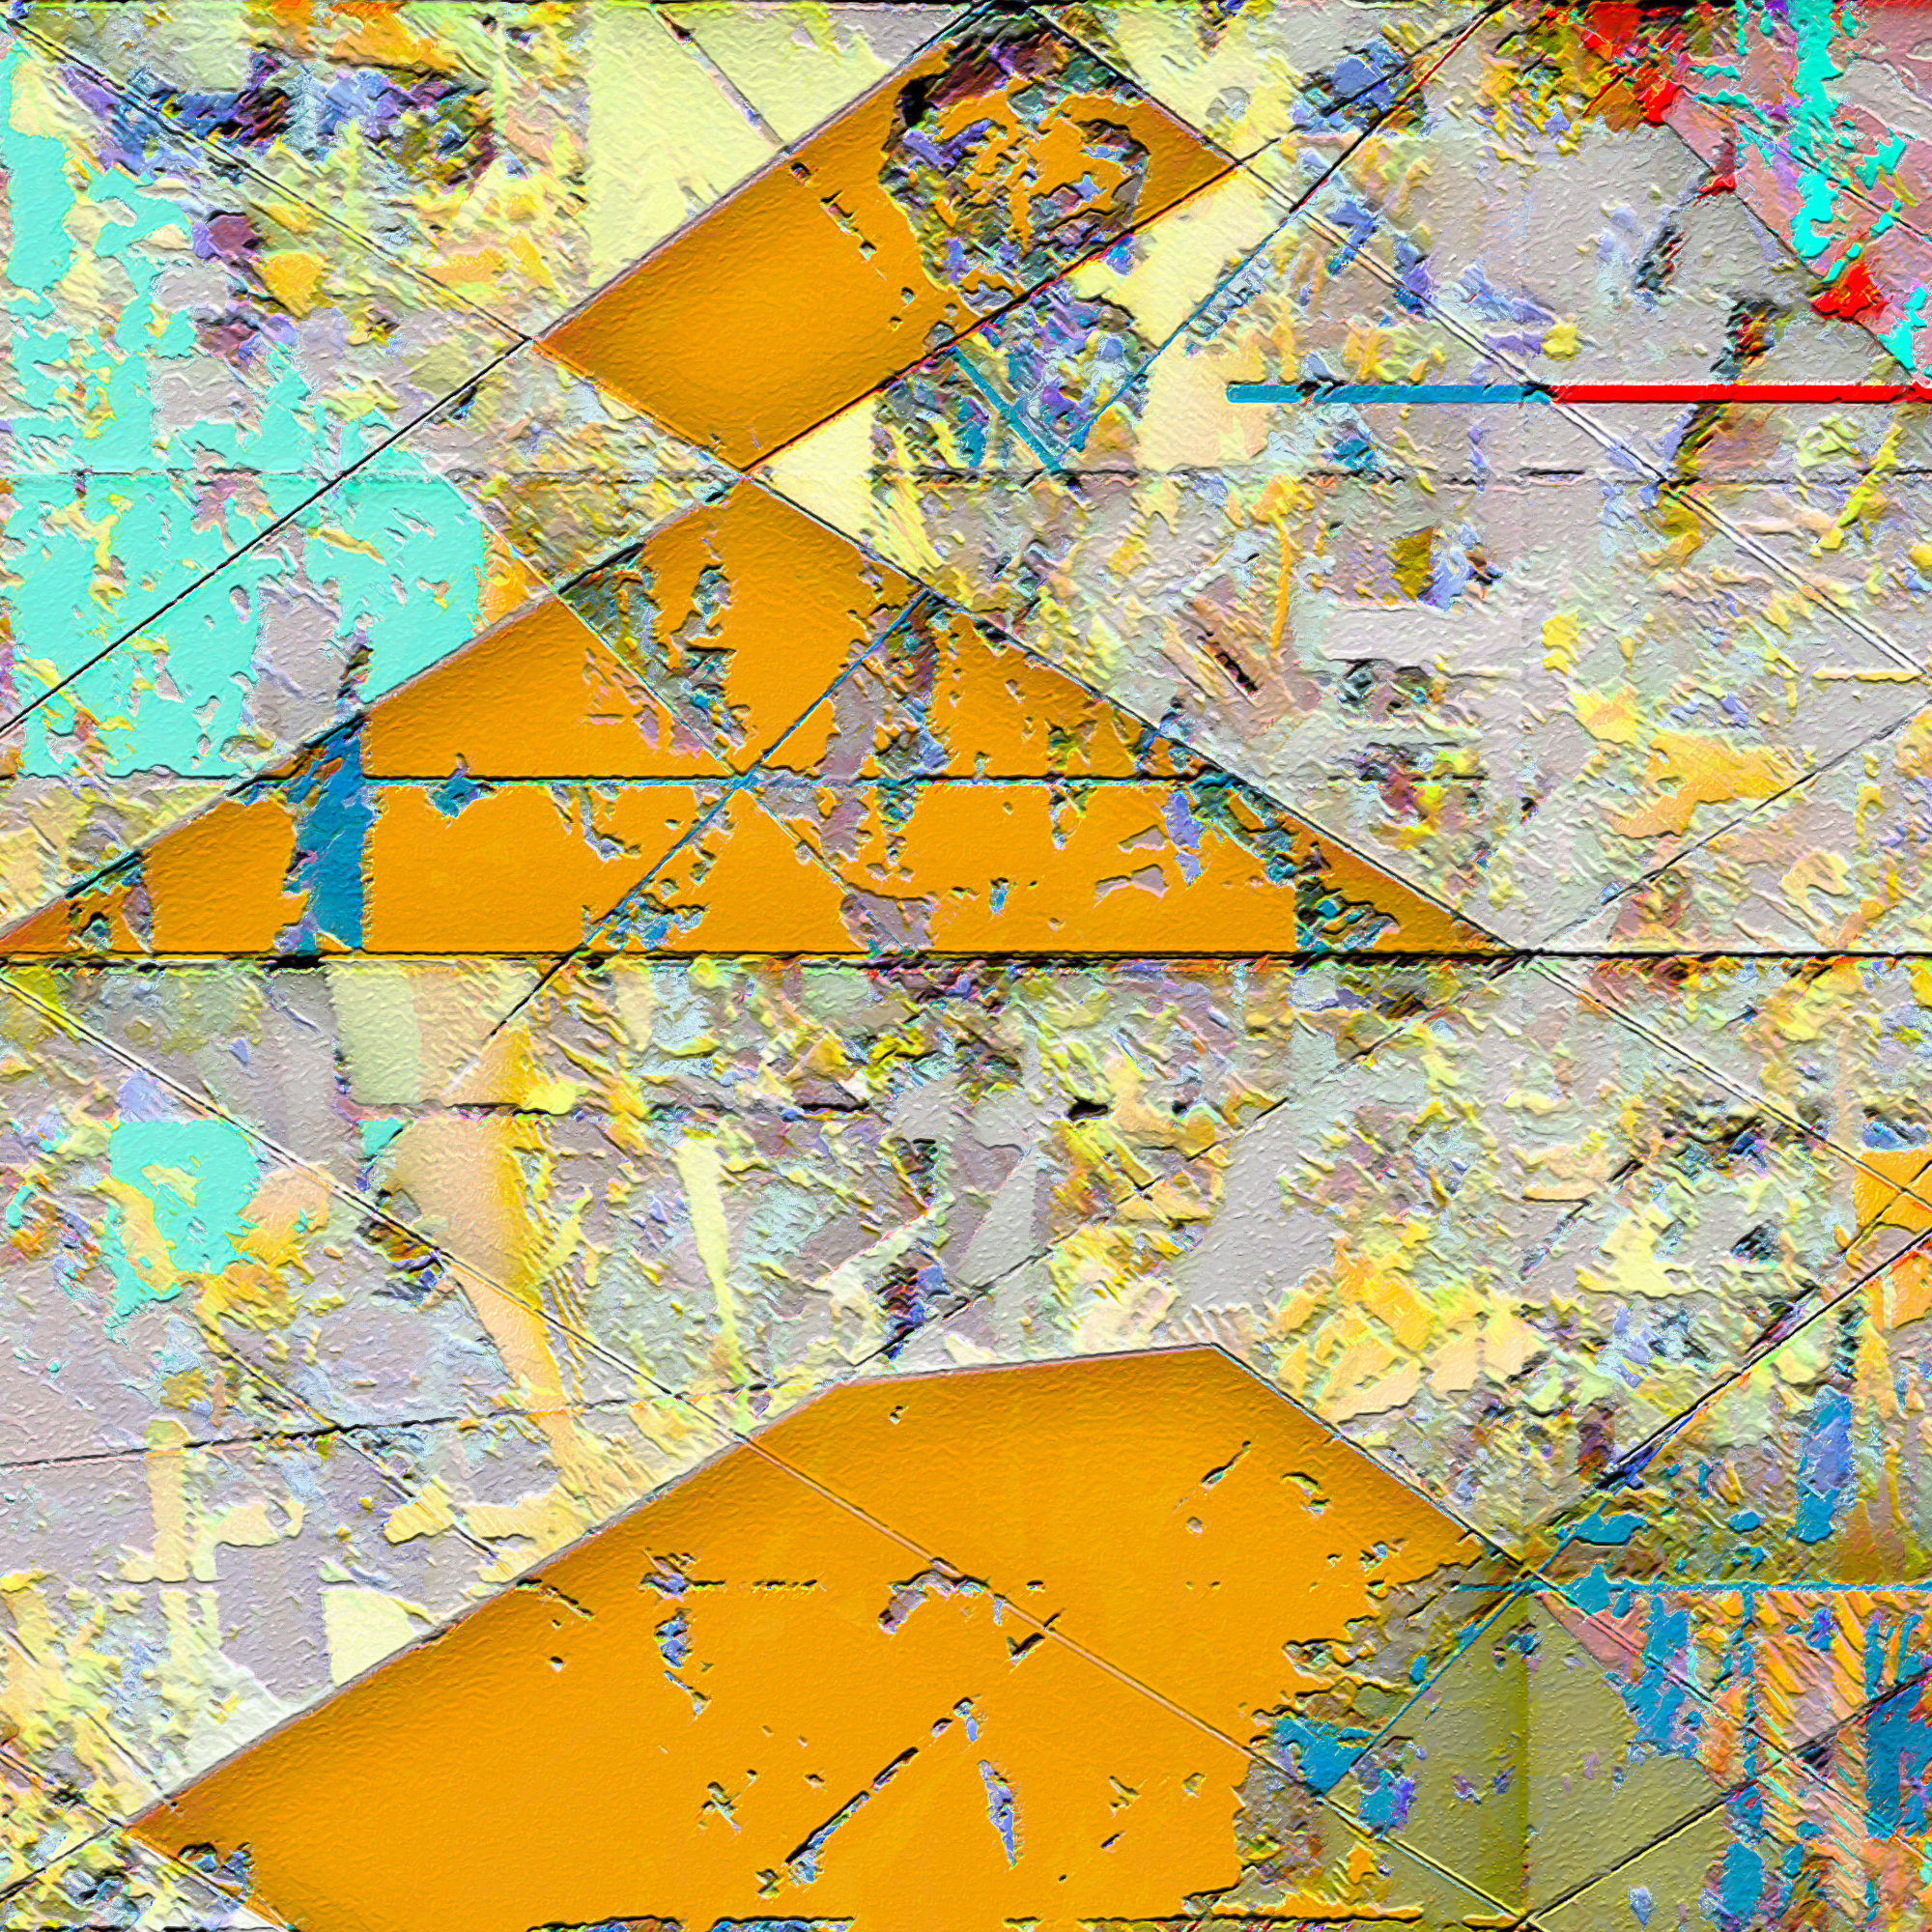 180805_Memory_Construction_Detail1.jpg